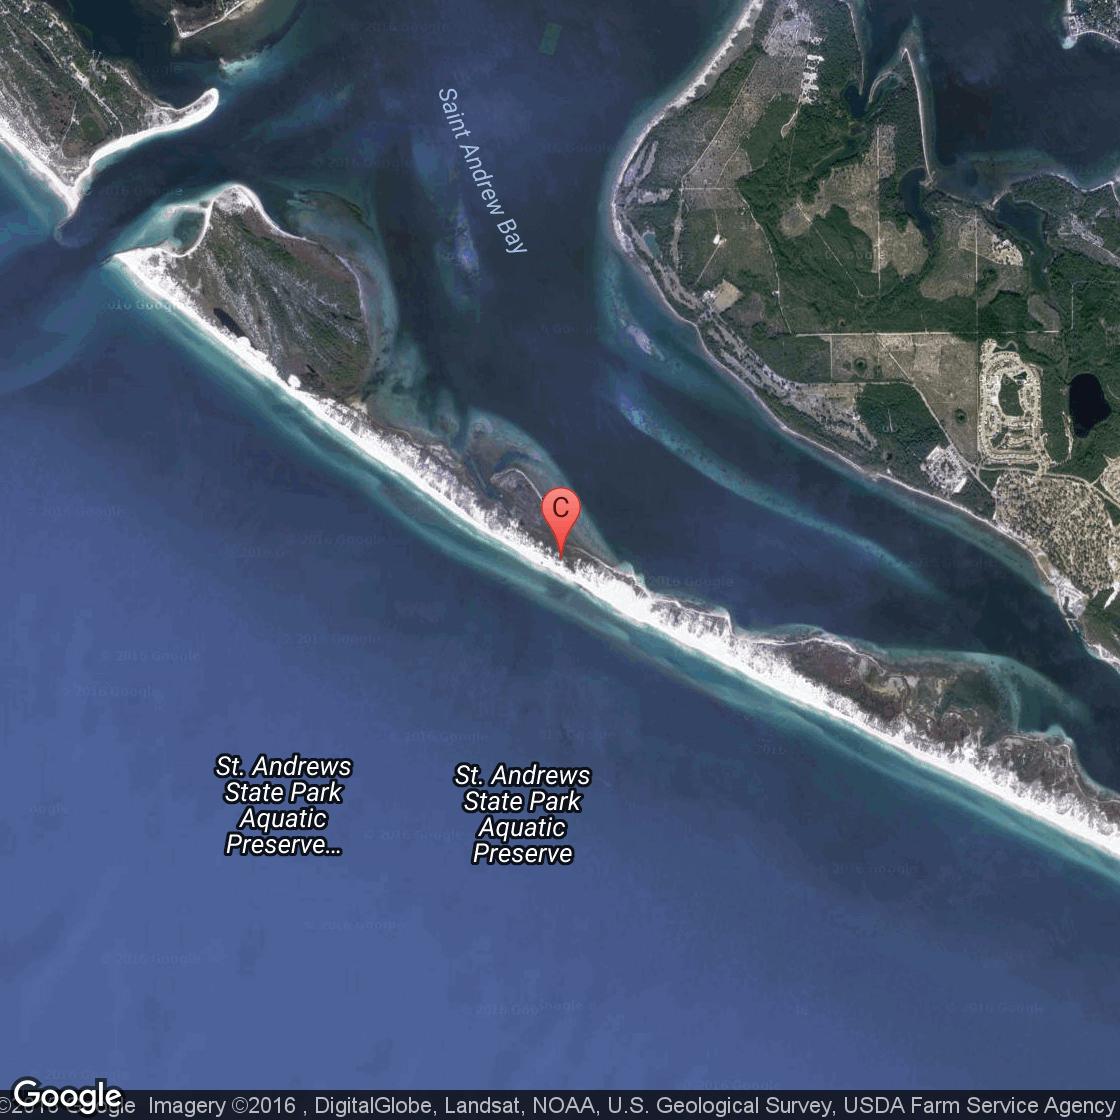 Myrtle Beach Snorkeling Tours